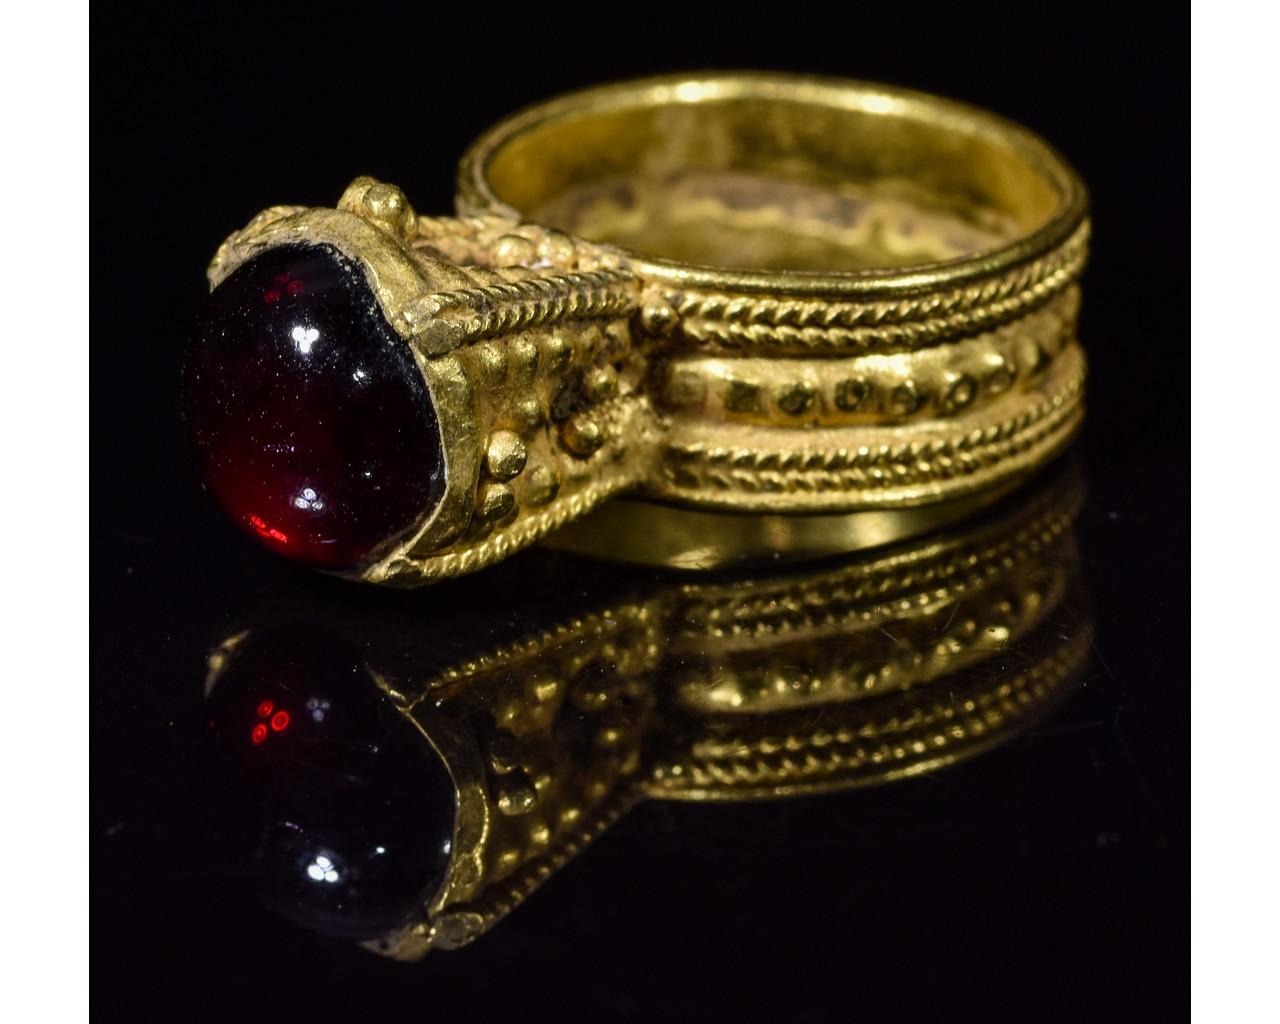 MEROVINGIAN GOLD RING WITH GARNET STONE